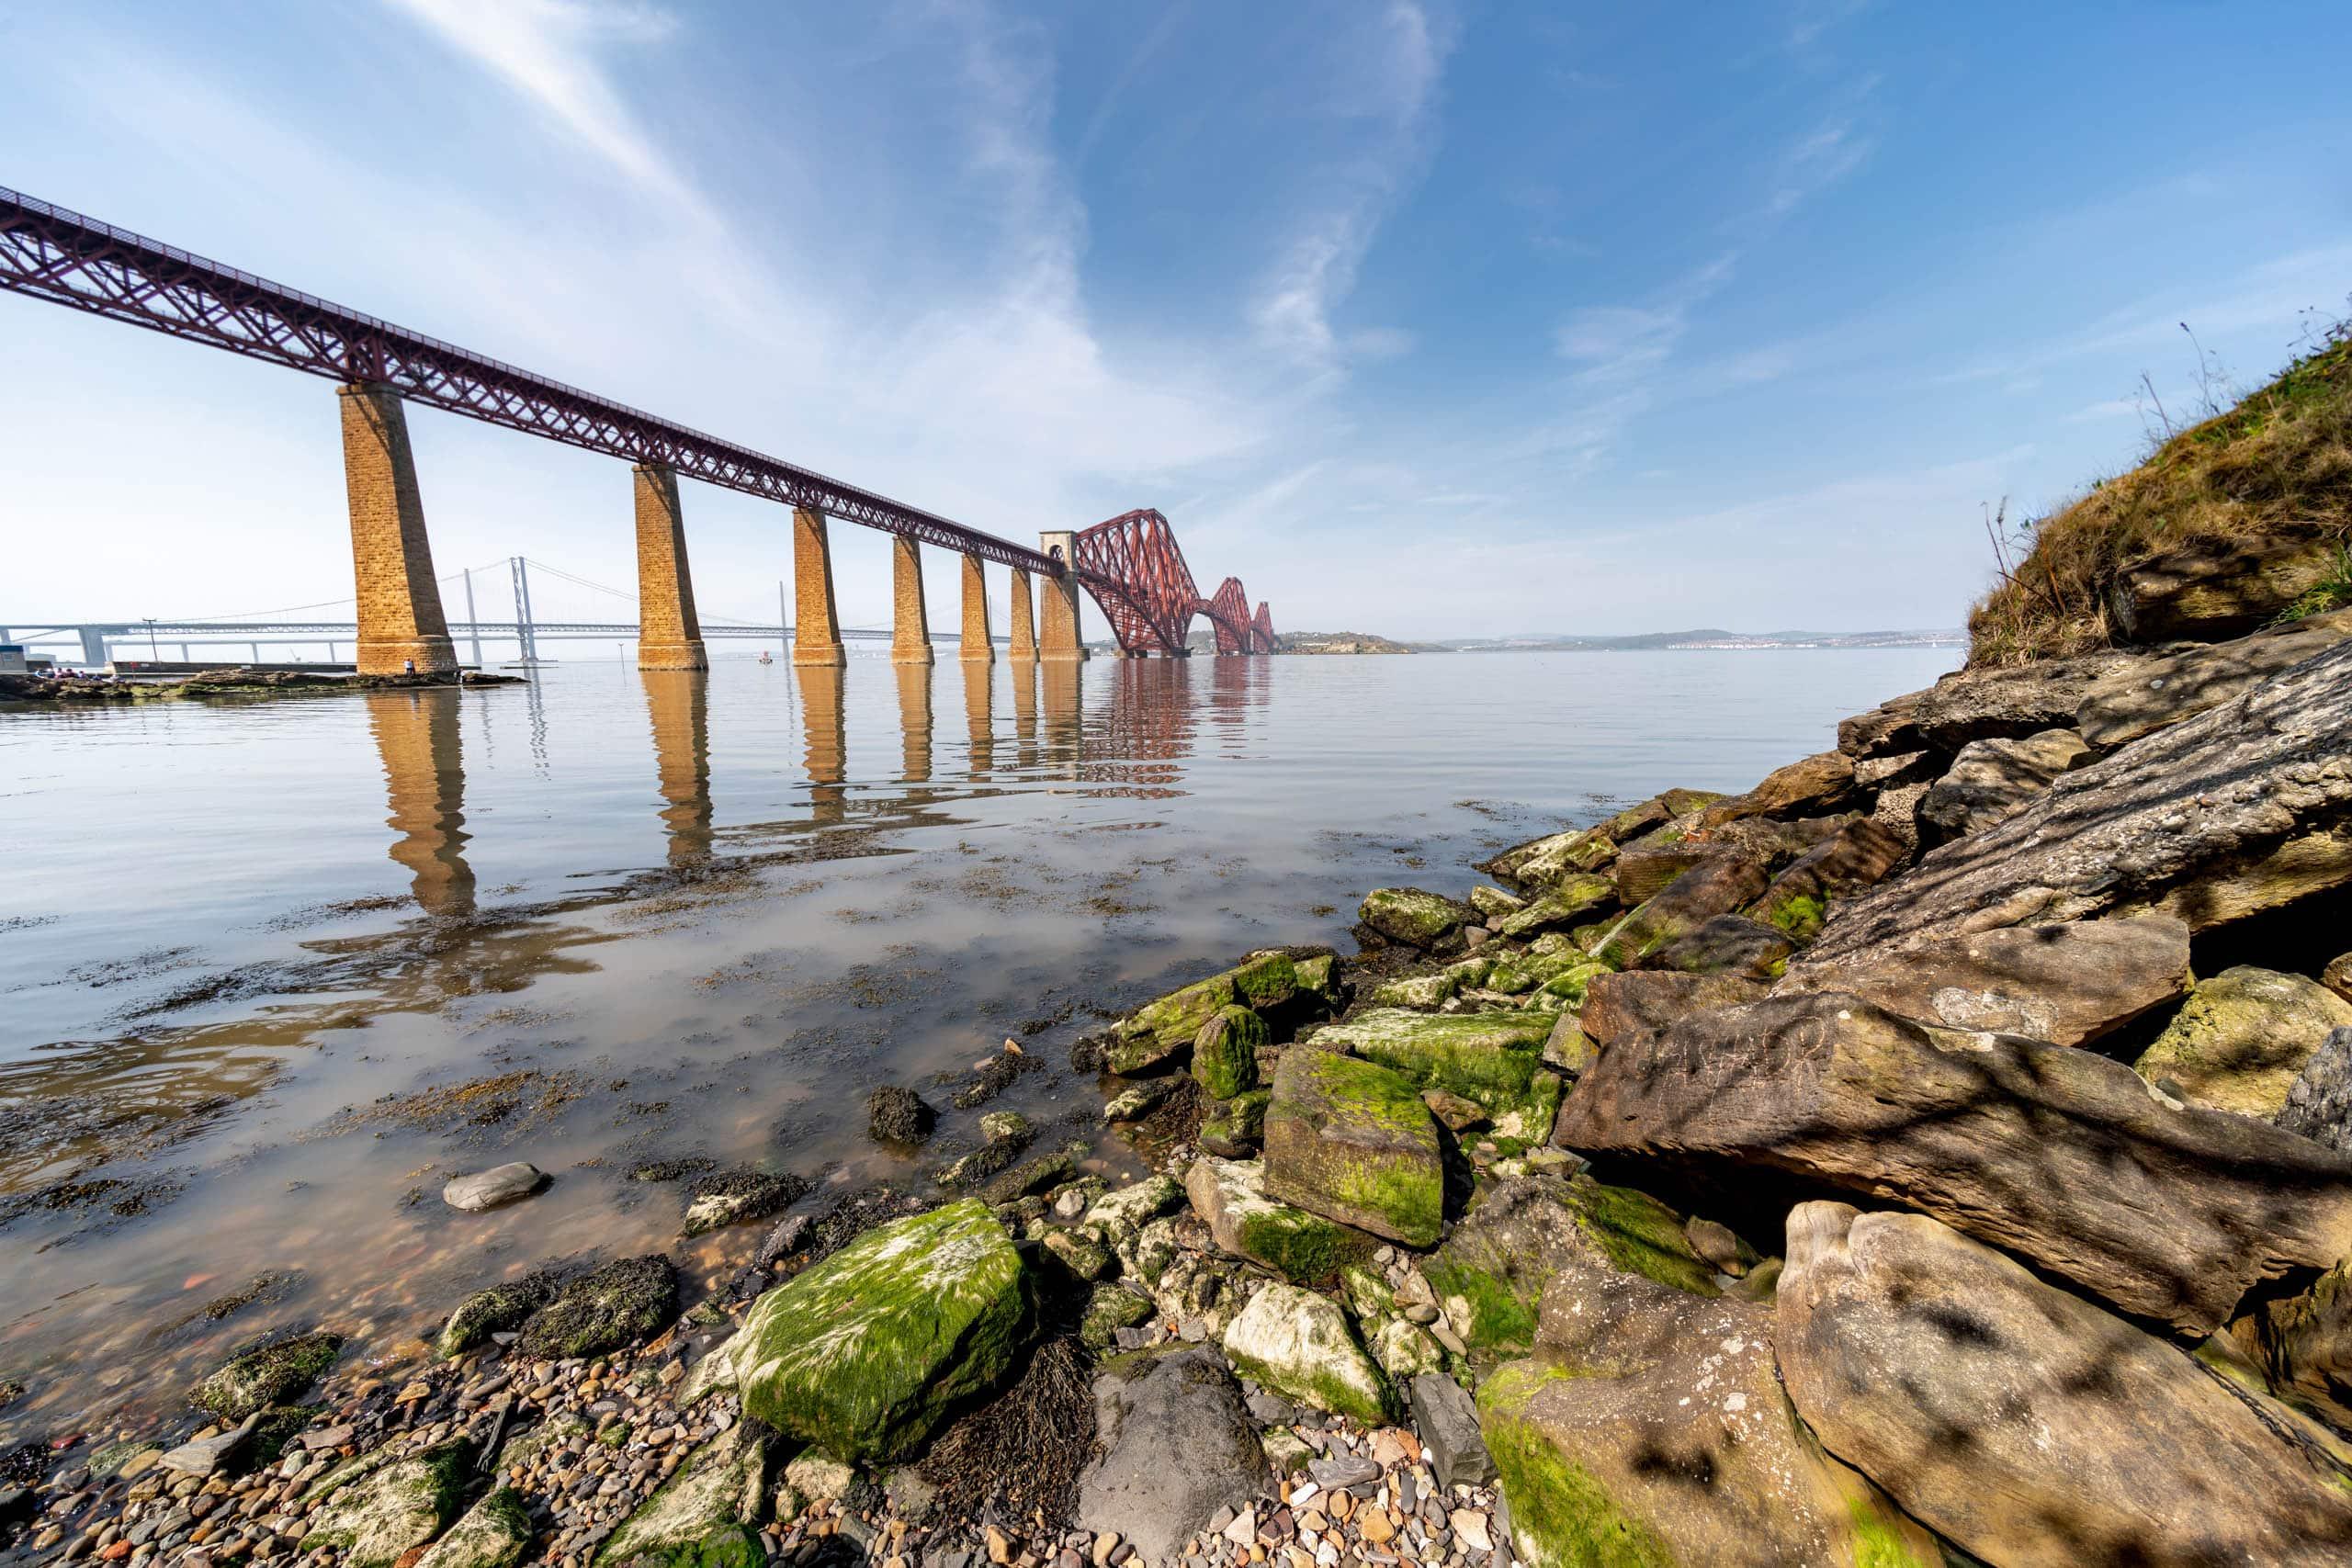 South Queensferry Rail Bridge | f/8 1/250sec ISO-100 12mm  | ILCE-7RM3